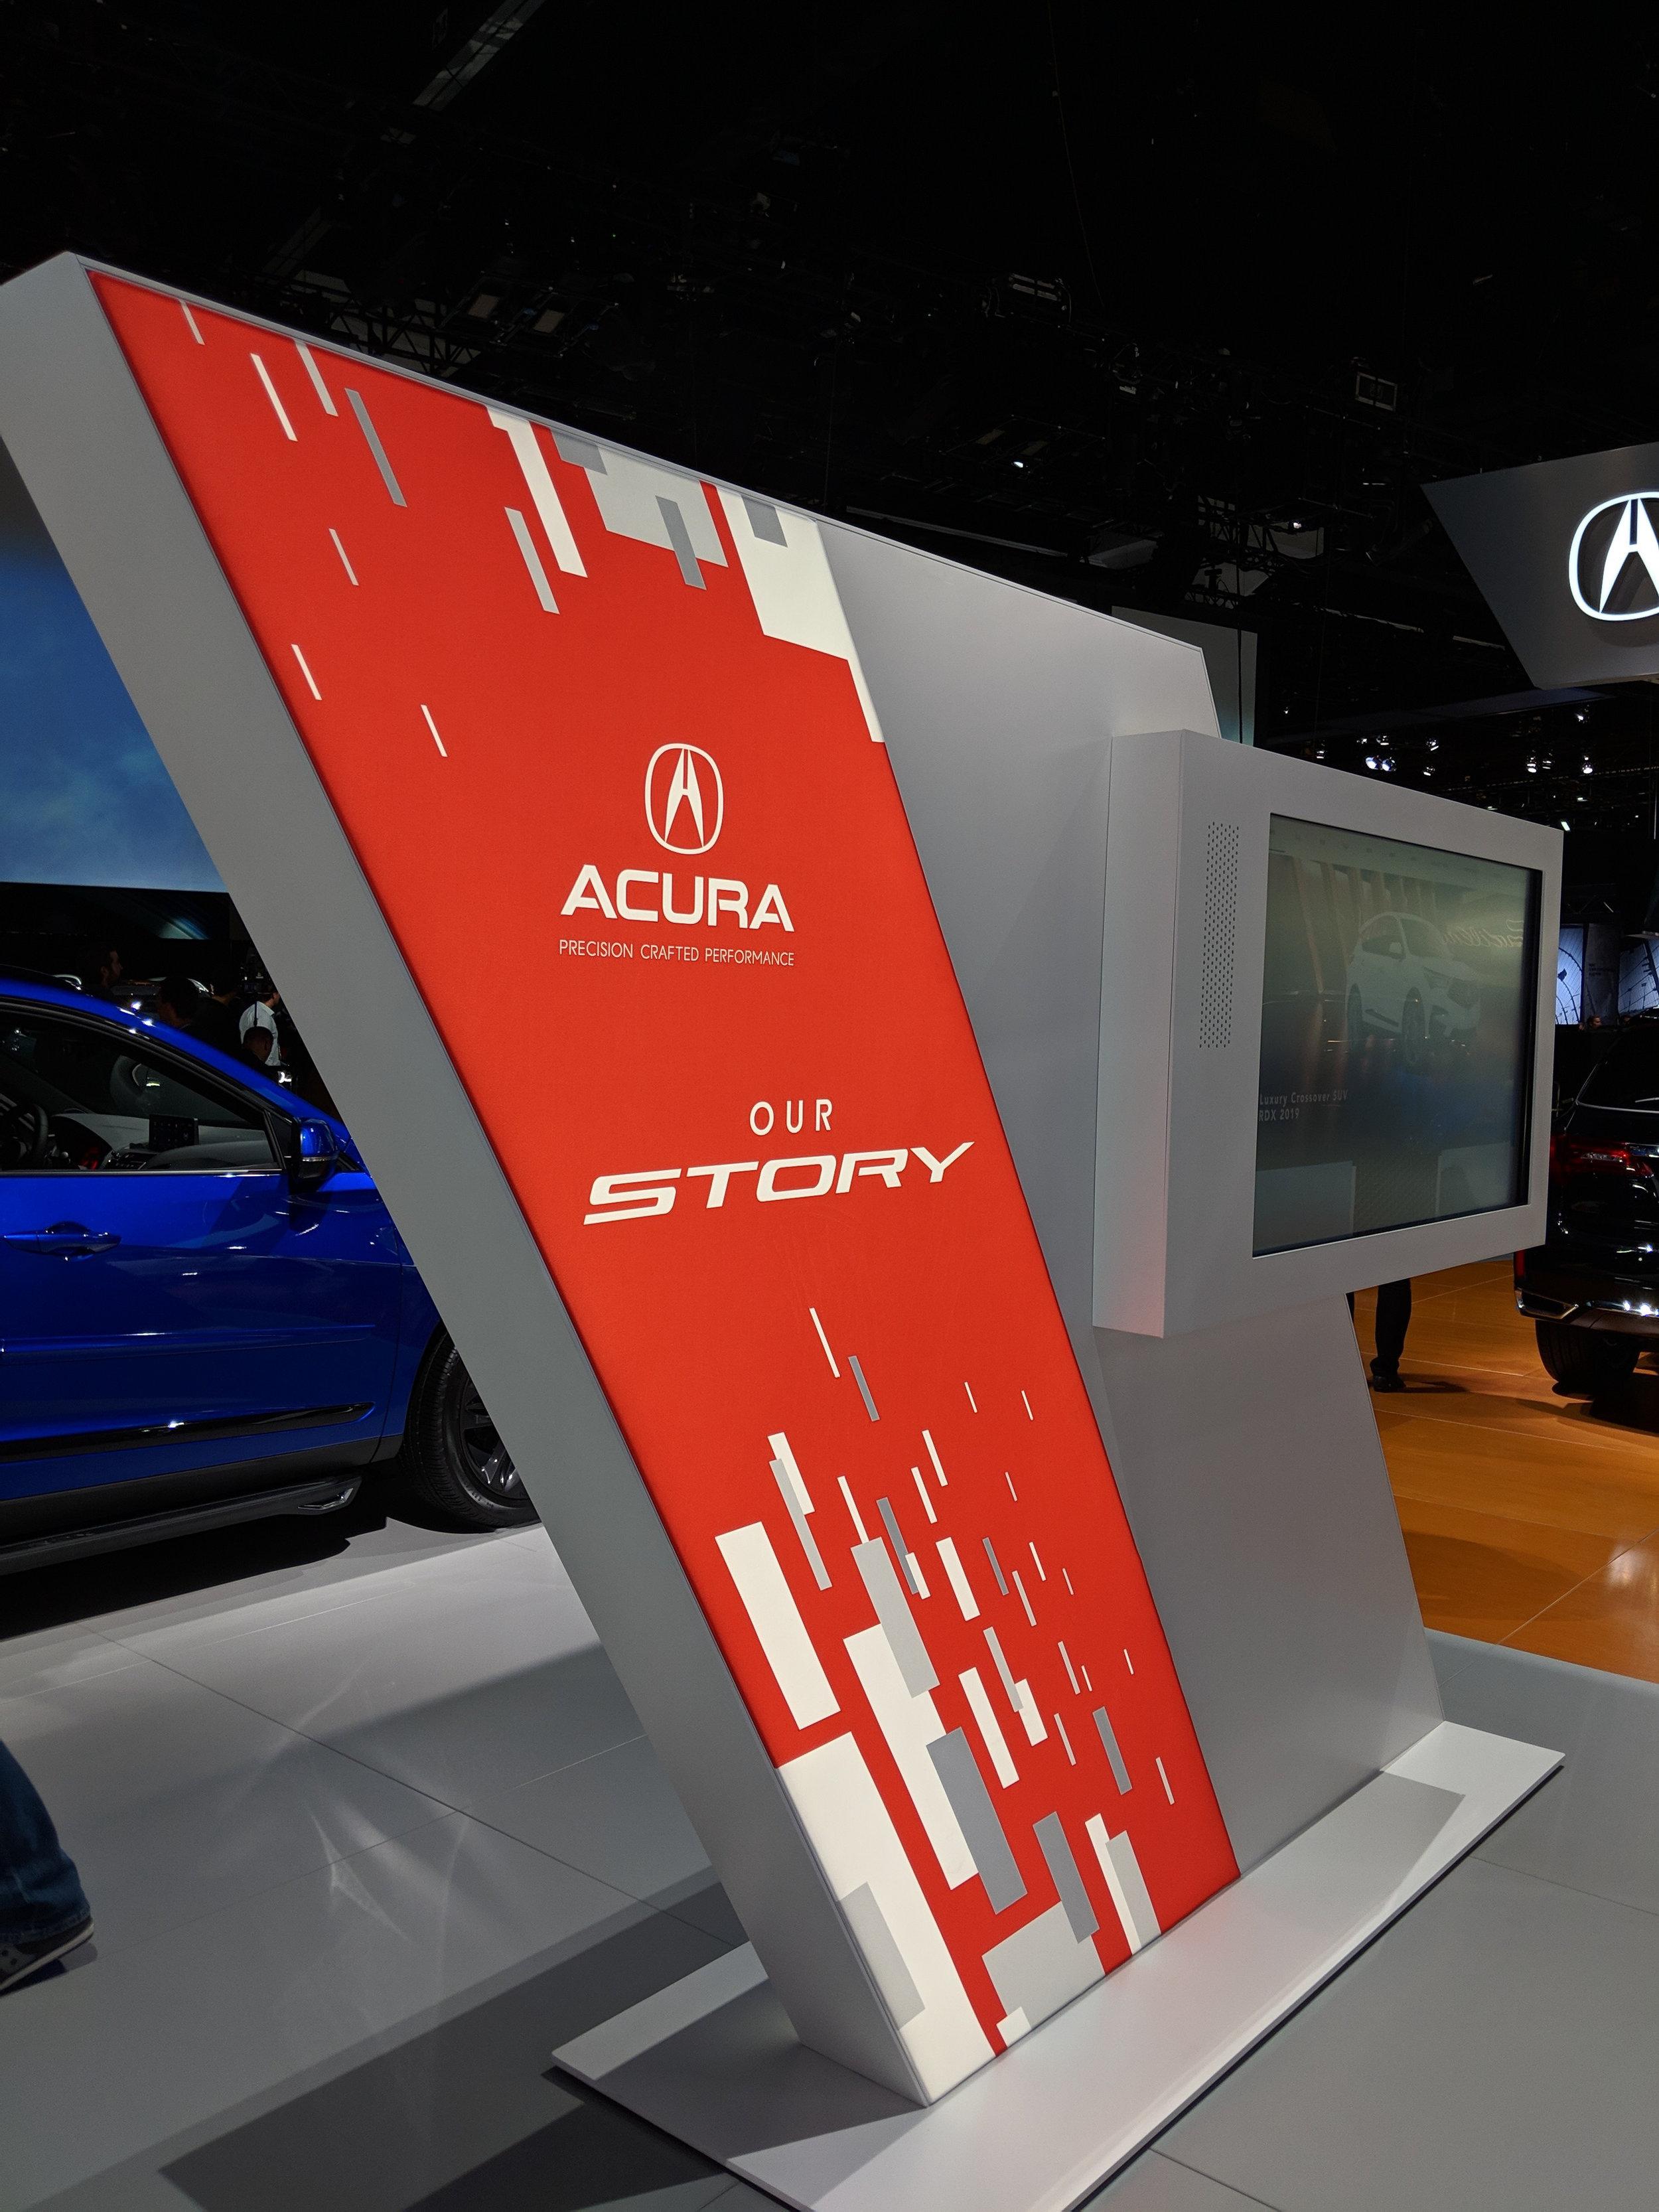 Interactive Pylon (Acura Story Side), LAIAS 2018, Acura + GPJ, 2018